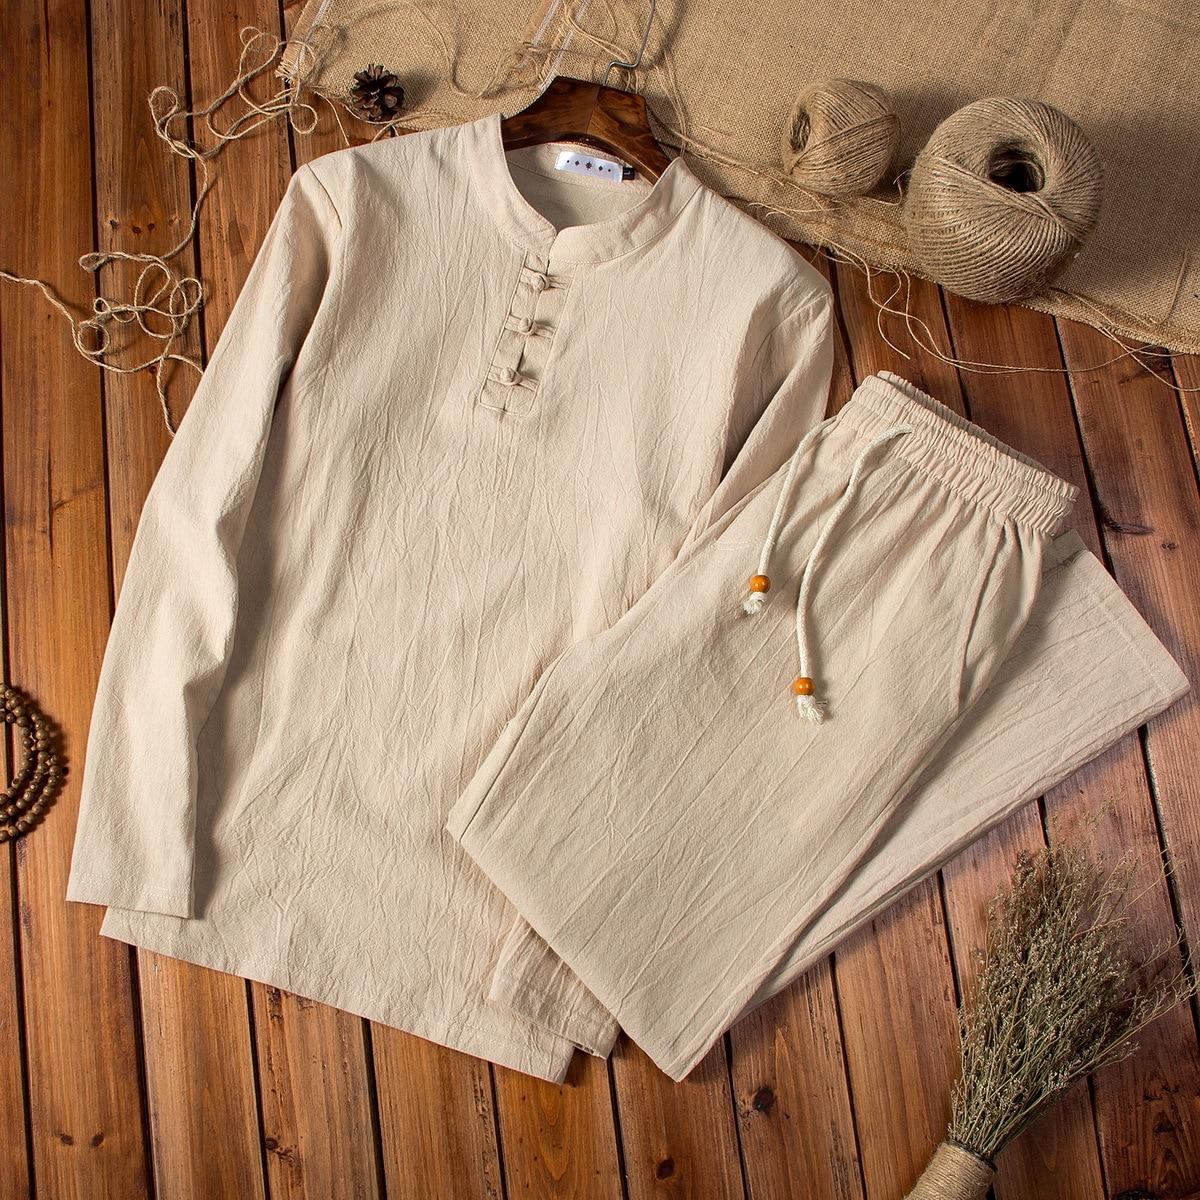 Chinese-style Cotton Linen Spring And Autumn Men Long Sleeve Trousers Set Large Size MEN'S Suit Men's Fashion Two Piece Set